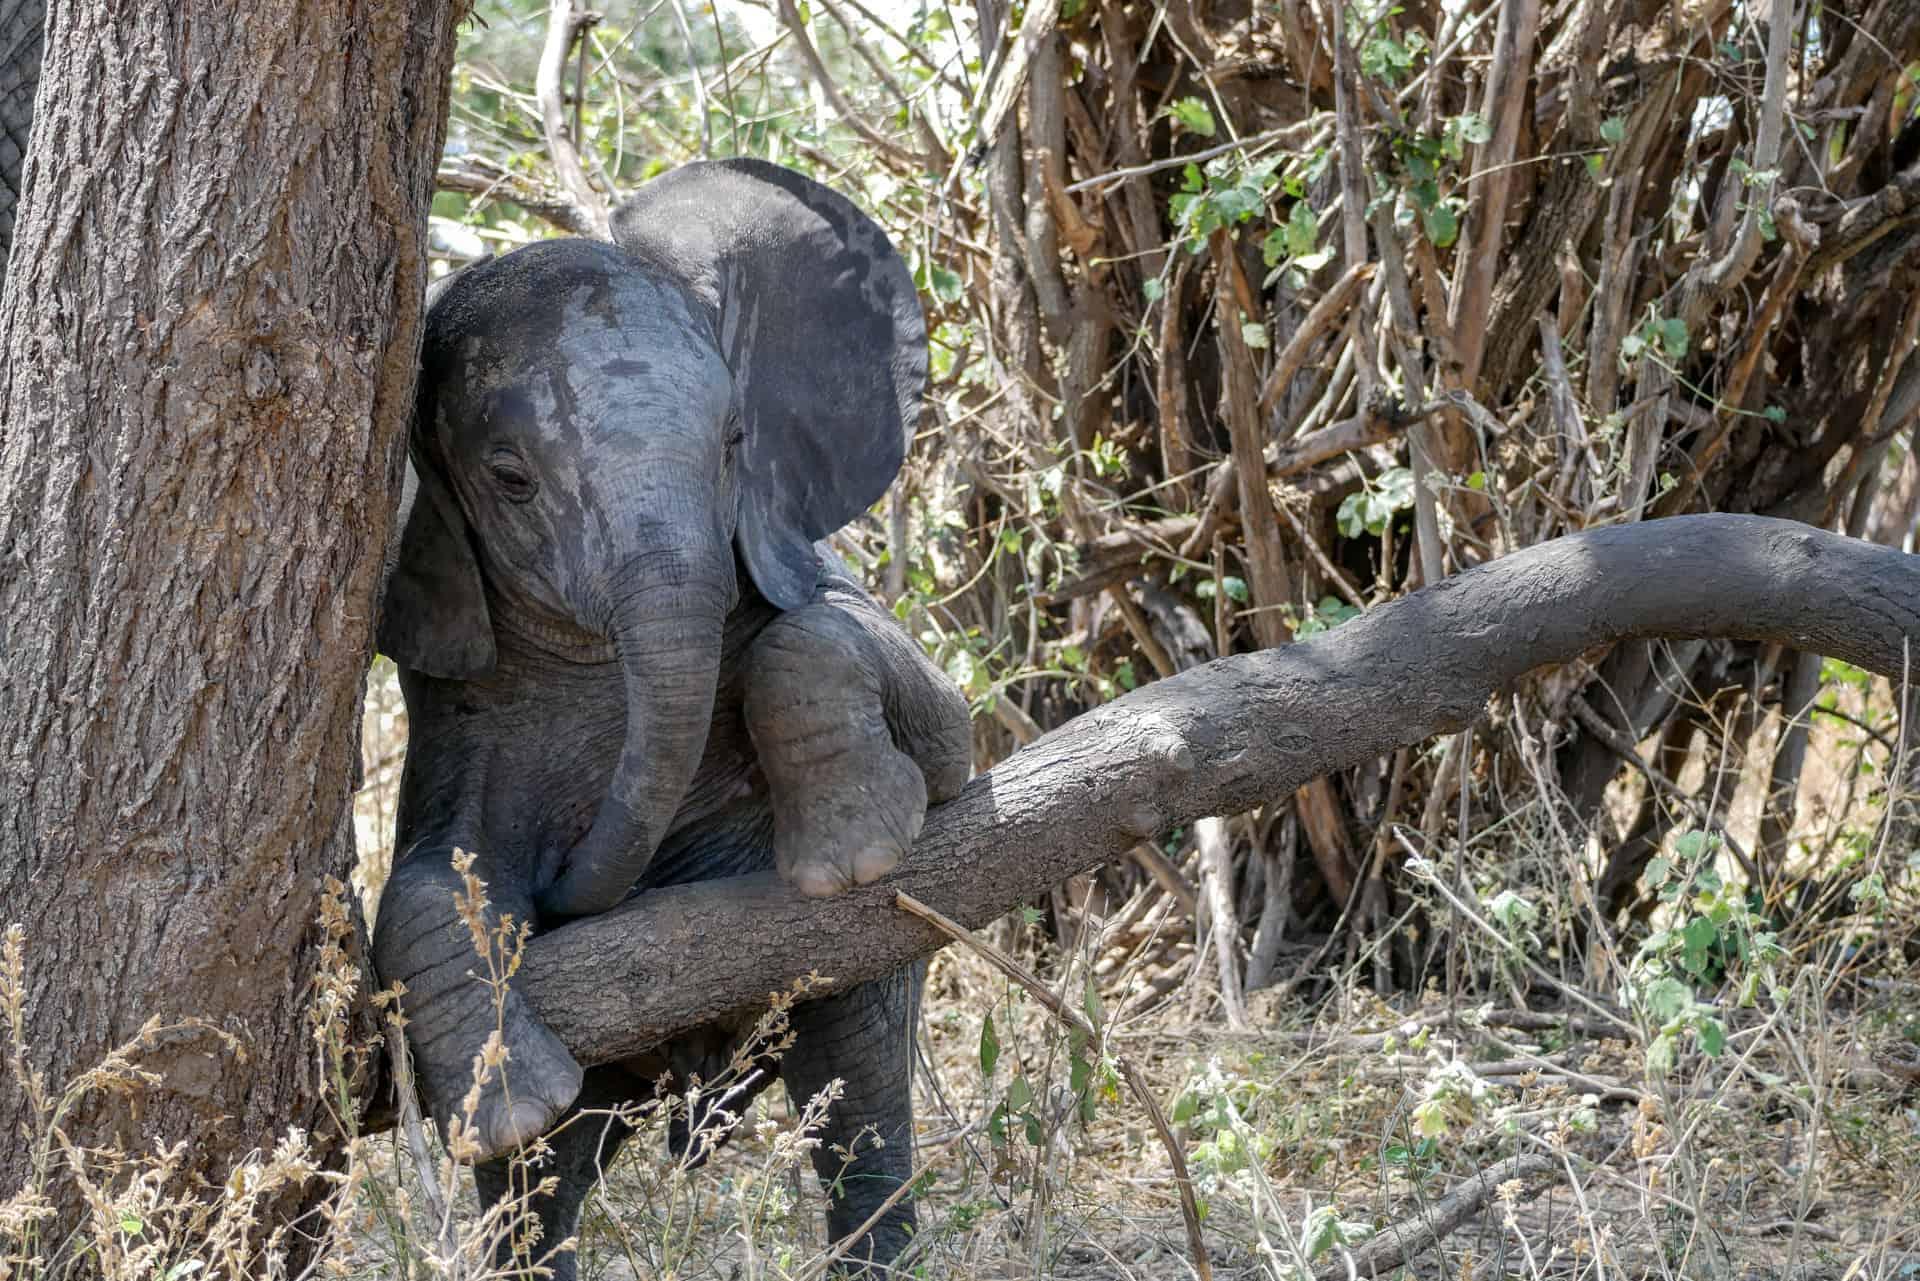 Tarangire olifant doet nog een circus truc